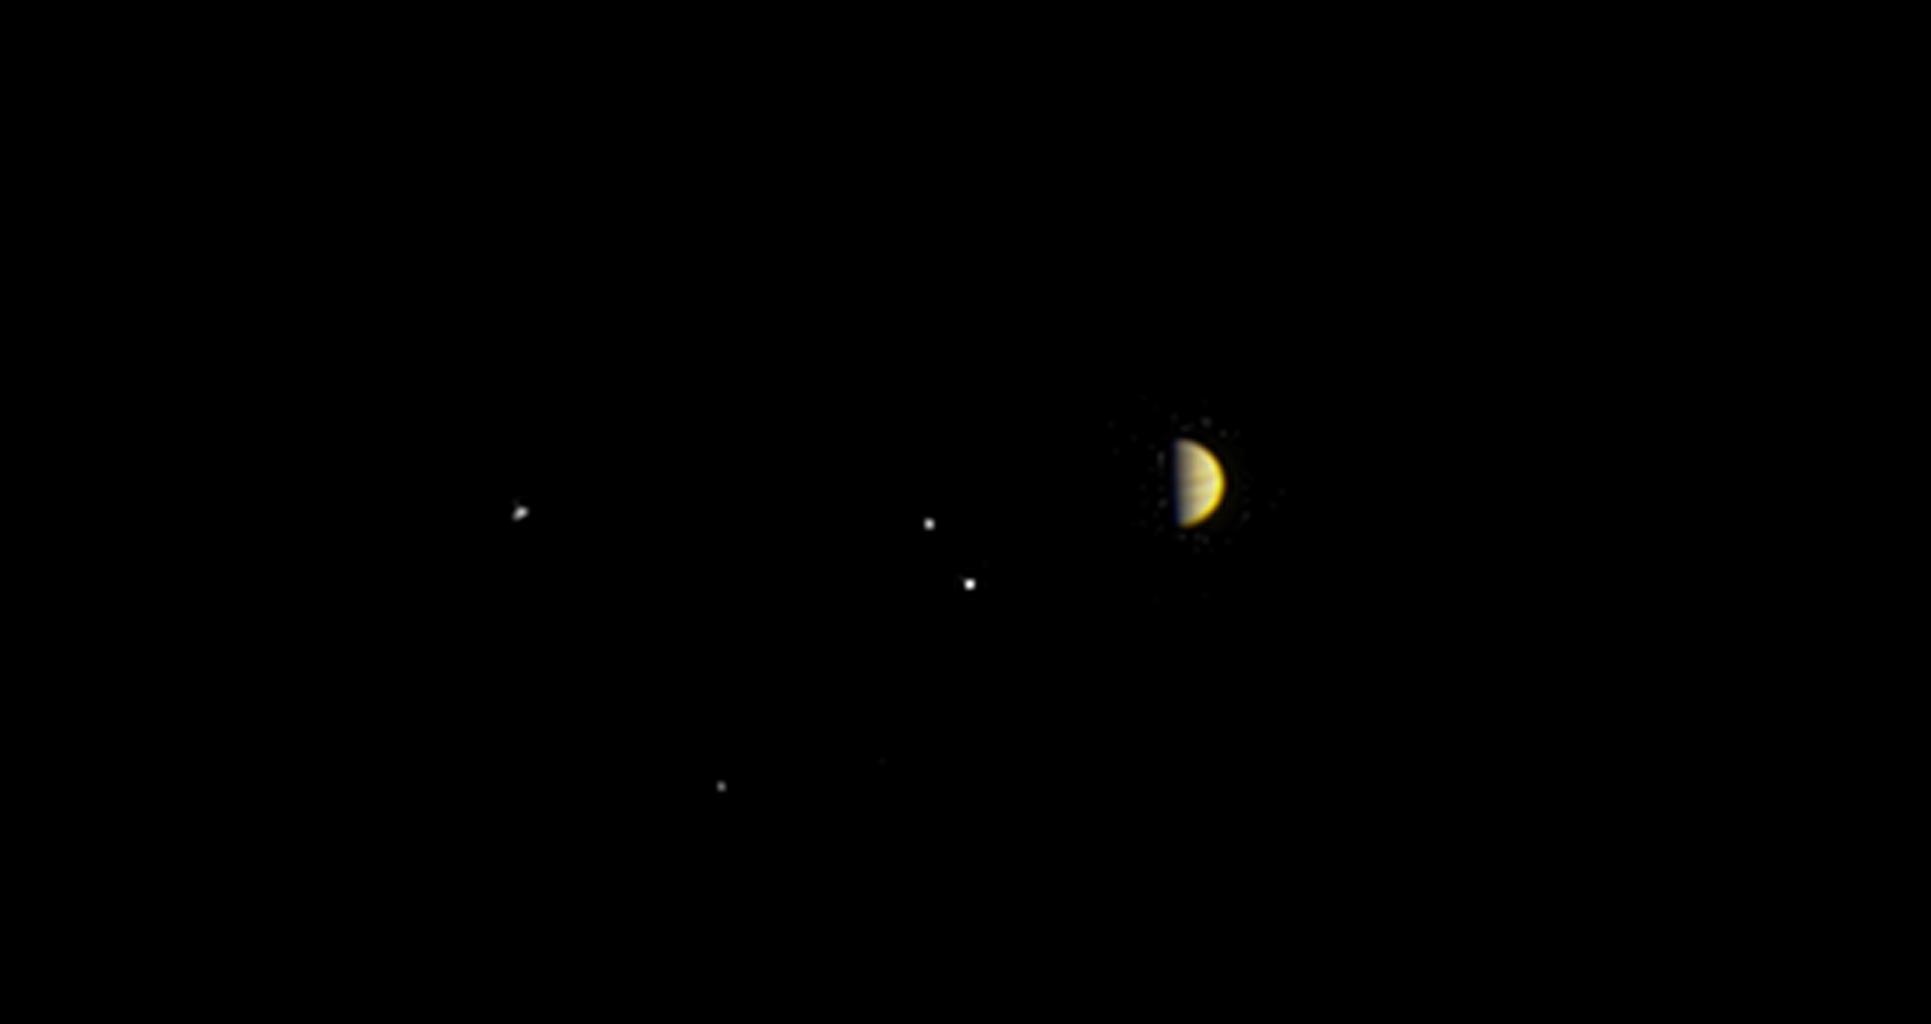 2016.06.28:NASAの探査機が木星に接近